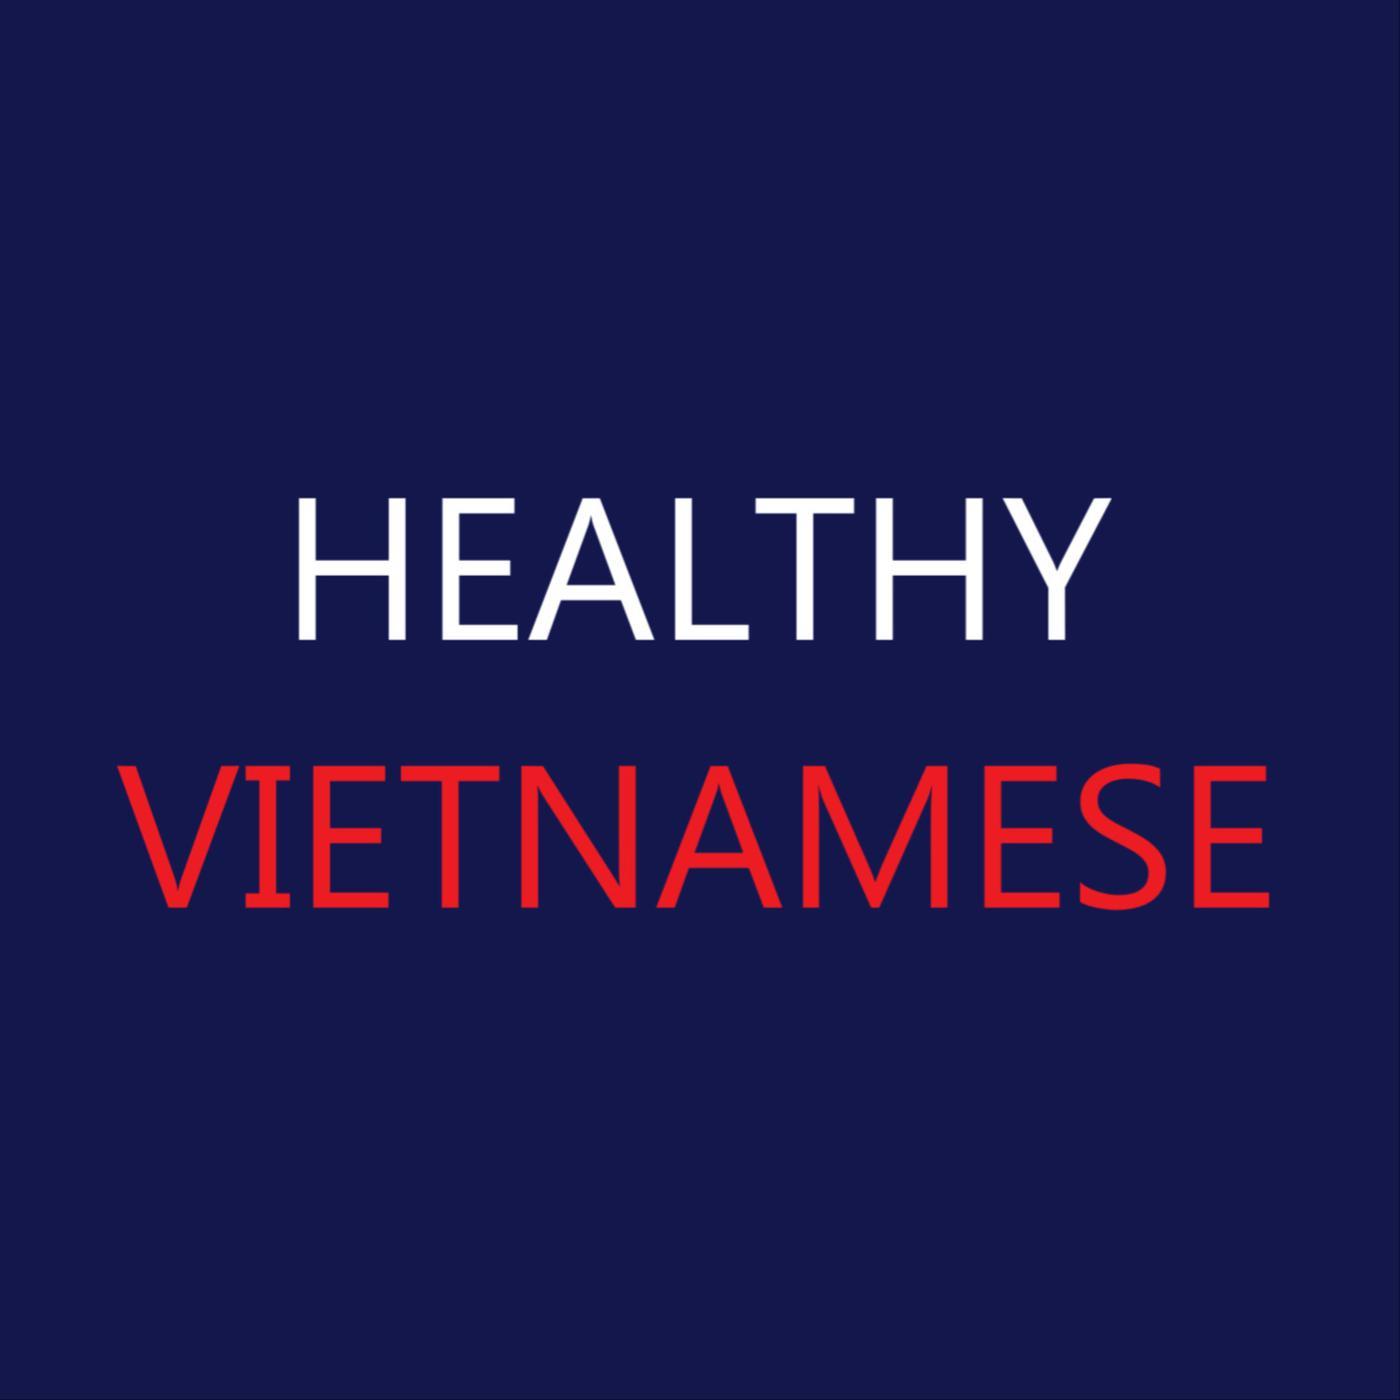 Healthy Vietnamese